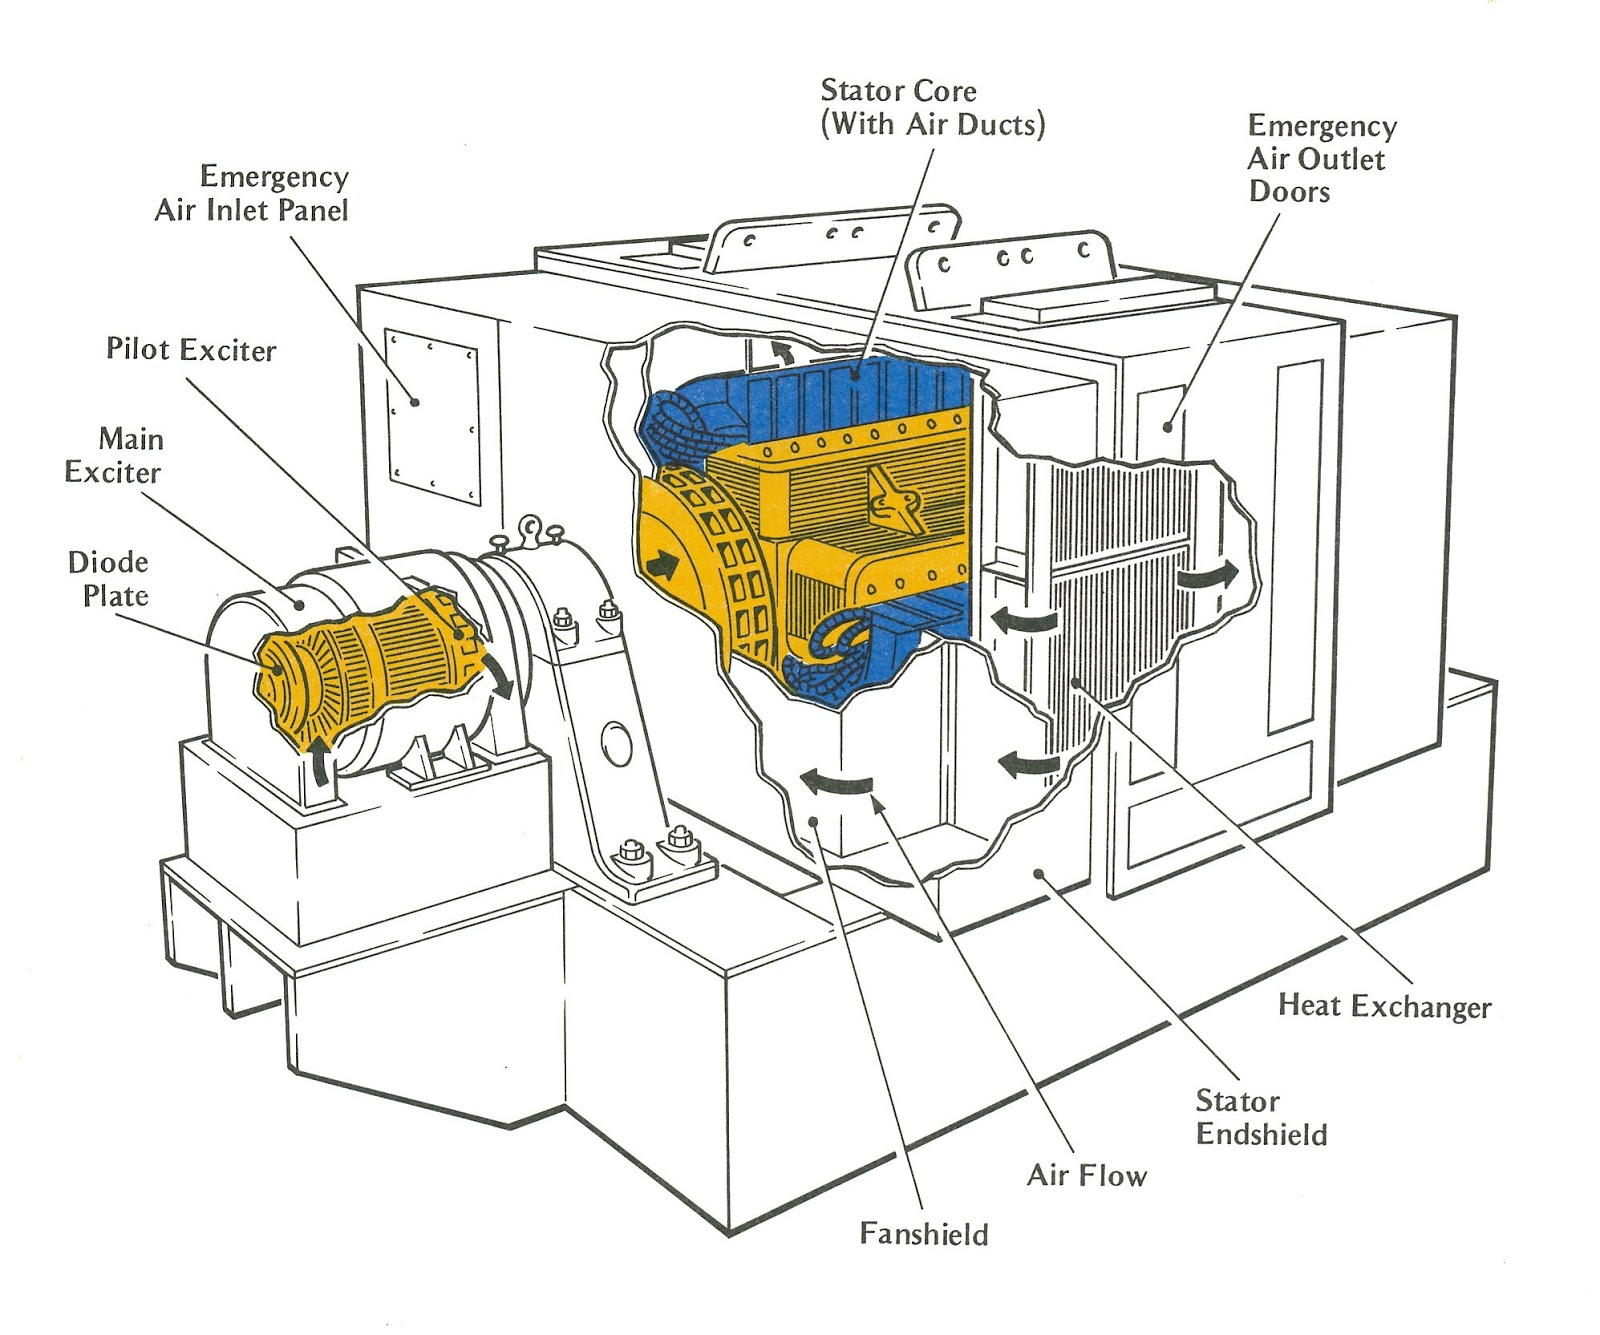 2 pole generator stator winding diagram wiring schematic